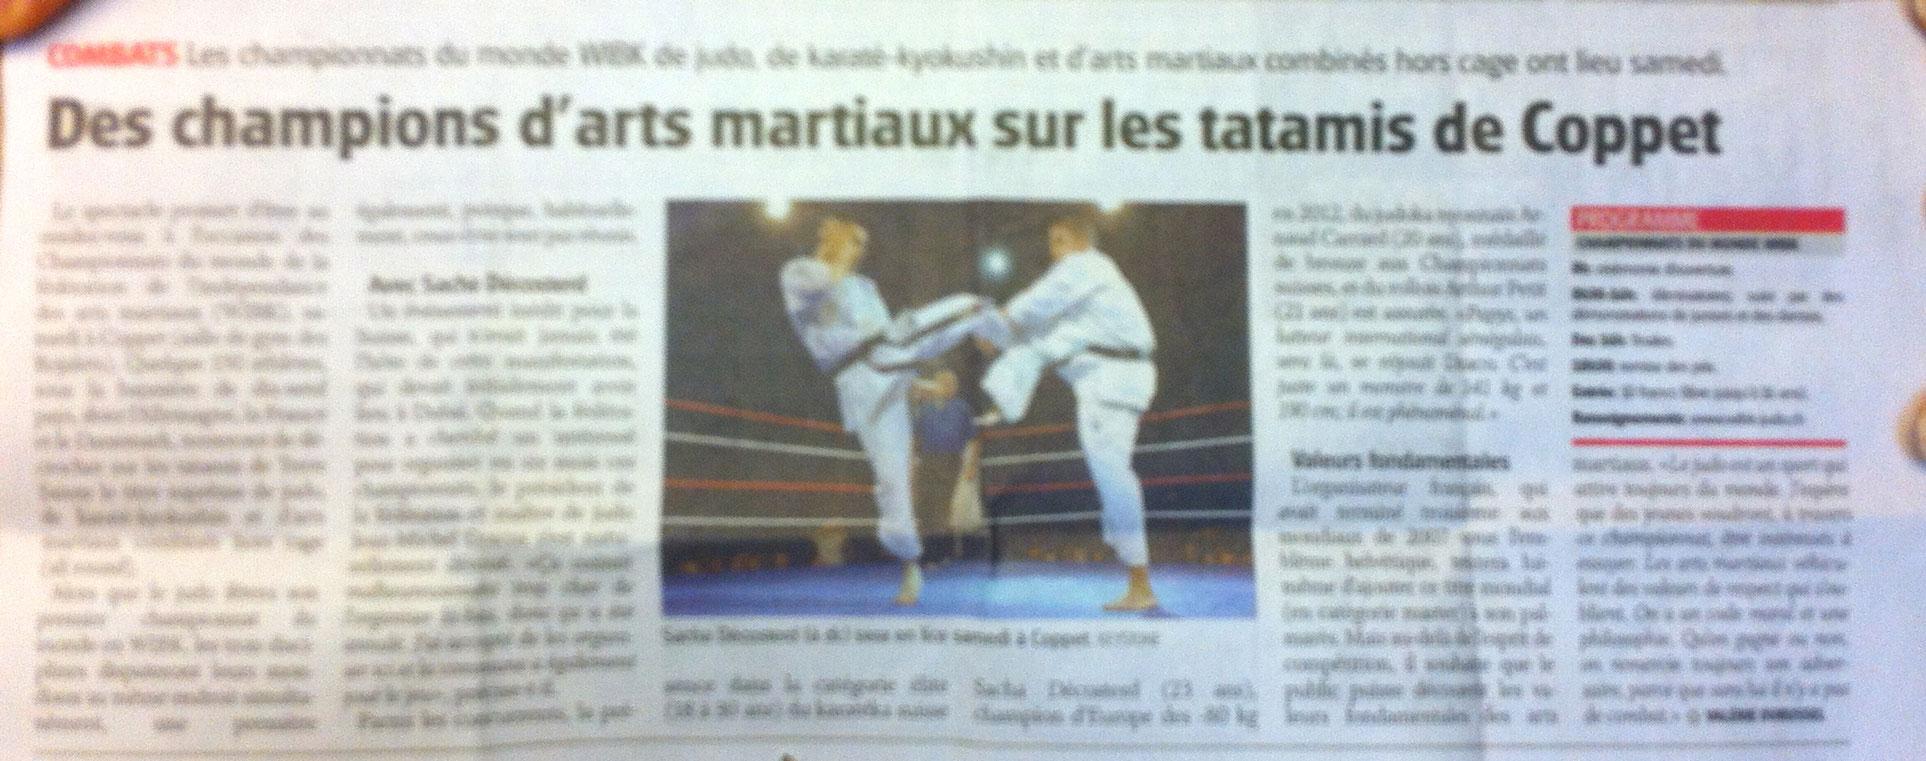 kyokushin-karate-club-geneva-20131123-le-matin